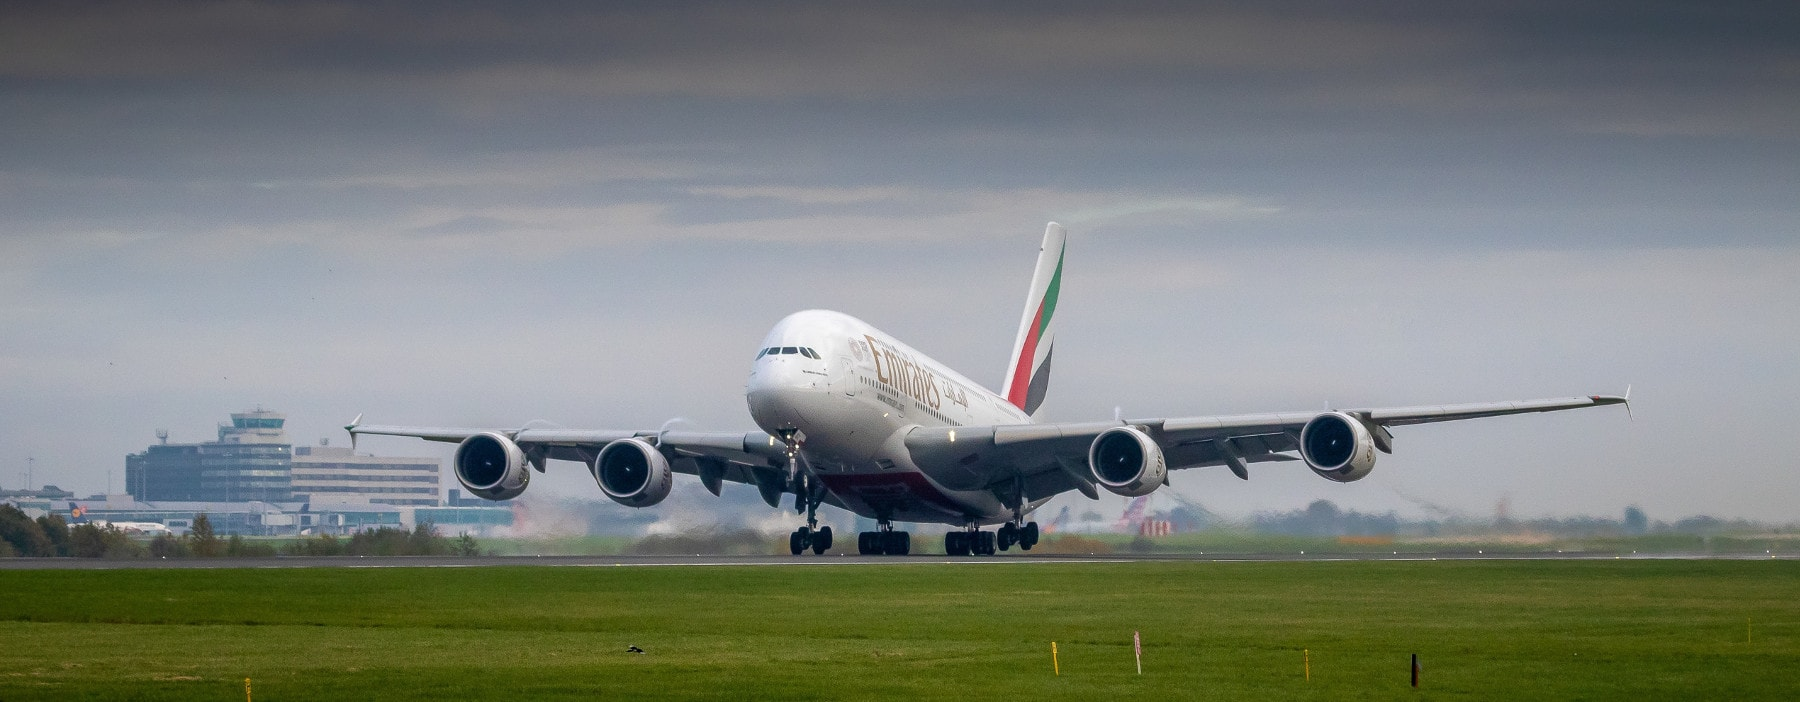 notizie-aviazione